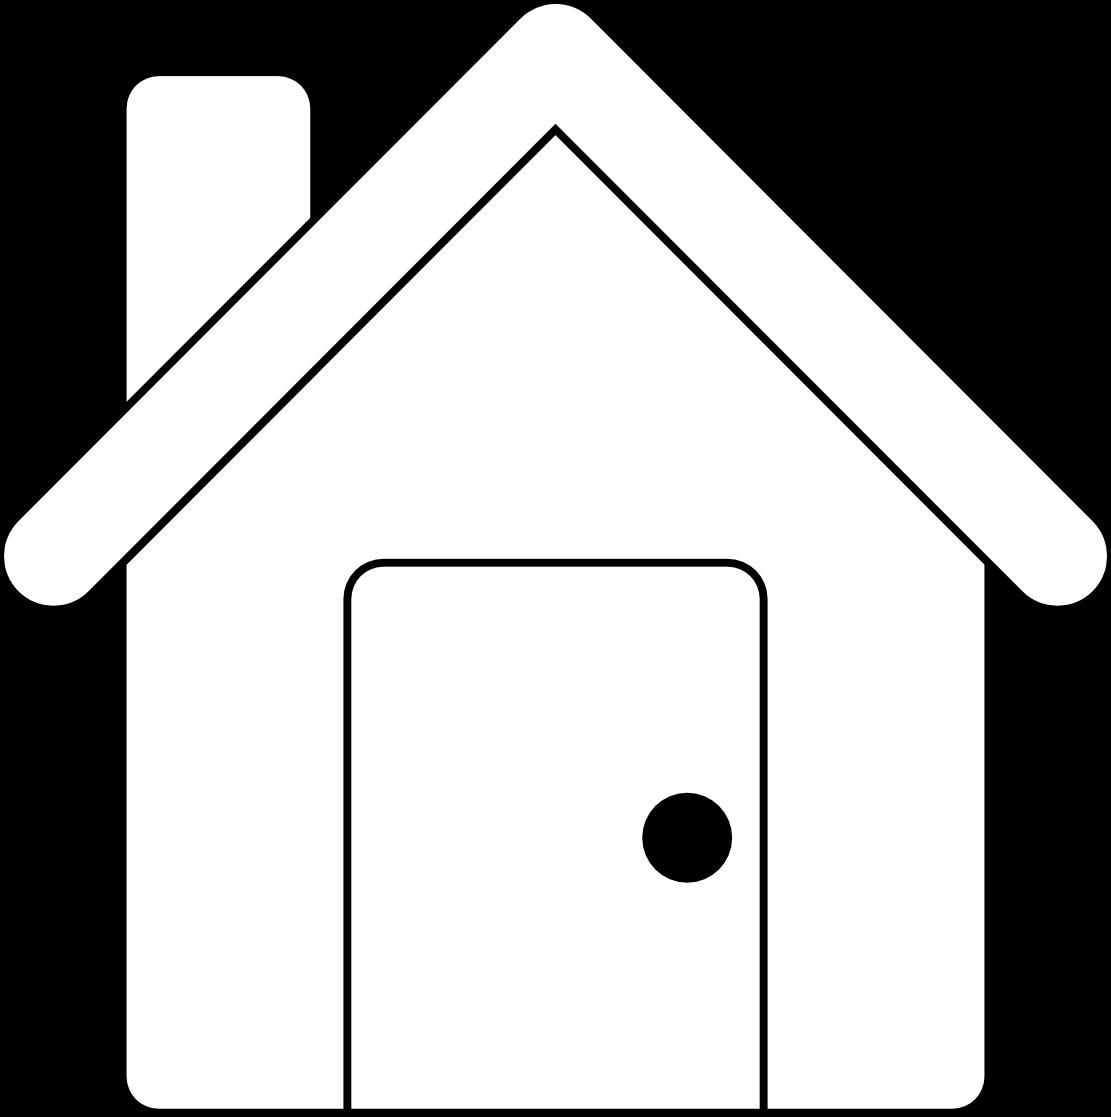 Hut clipart ghar. Free black house cliparts